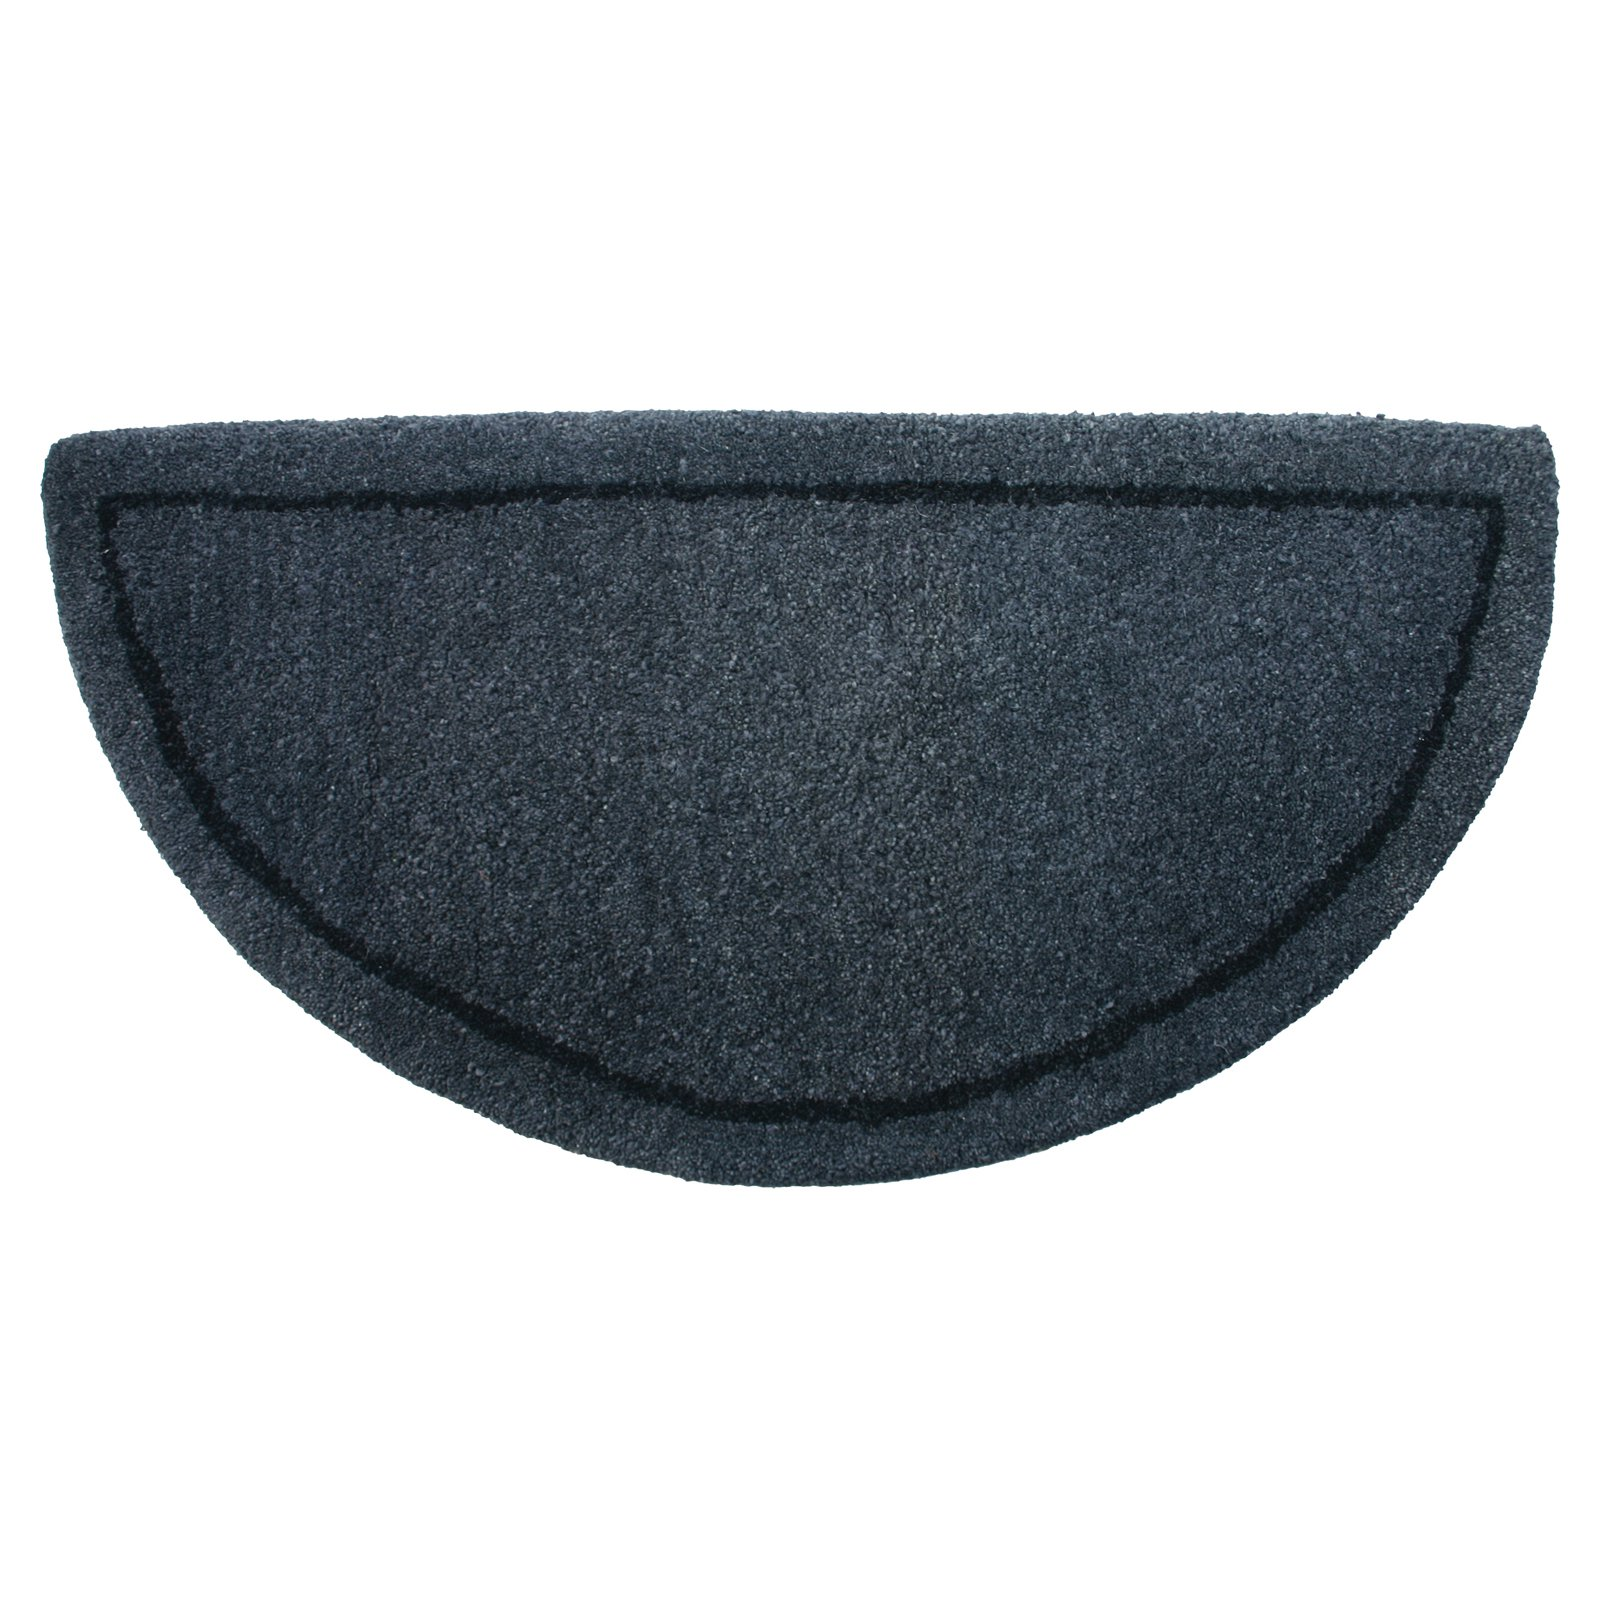 Hand-Tufted Wool Hearth Rug by Blue Rhino Global Sourcing, LLC